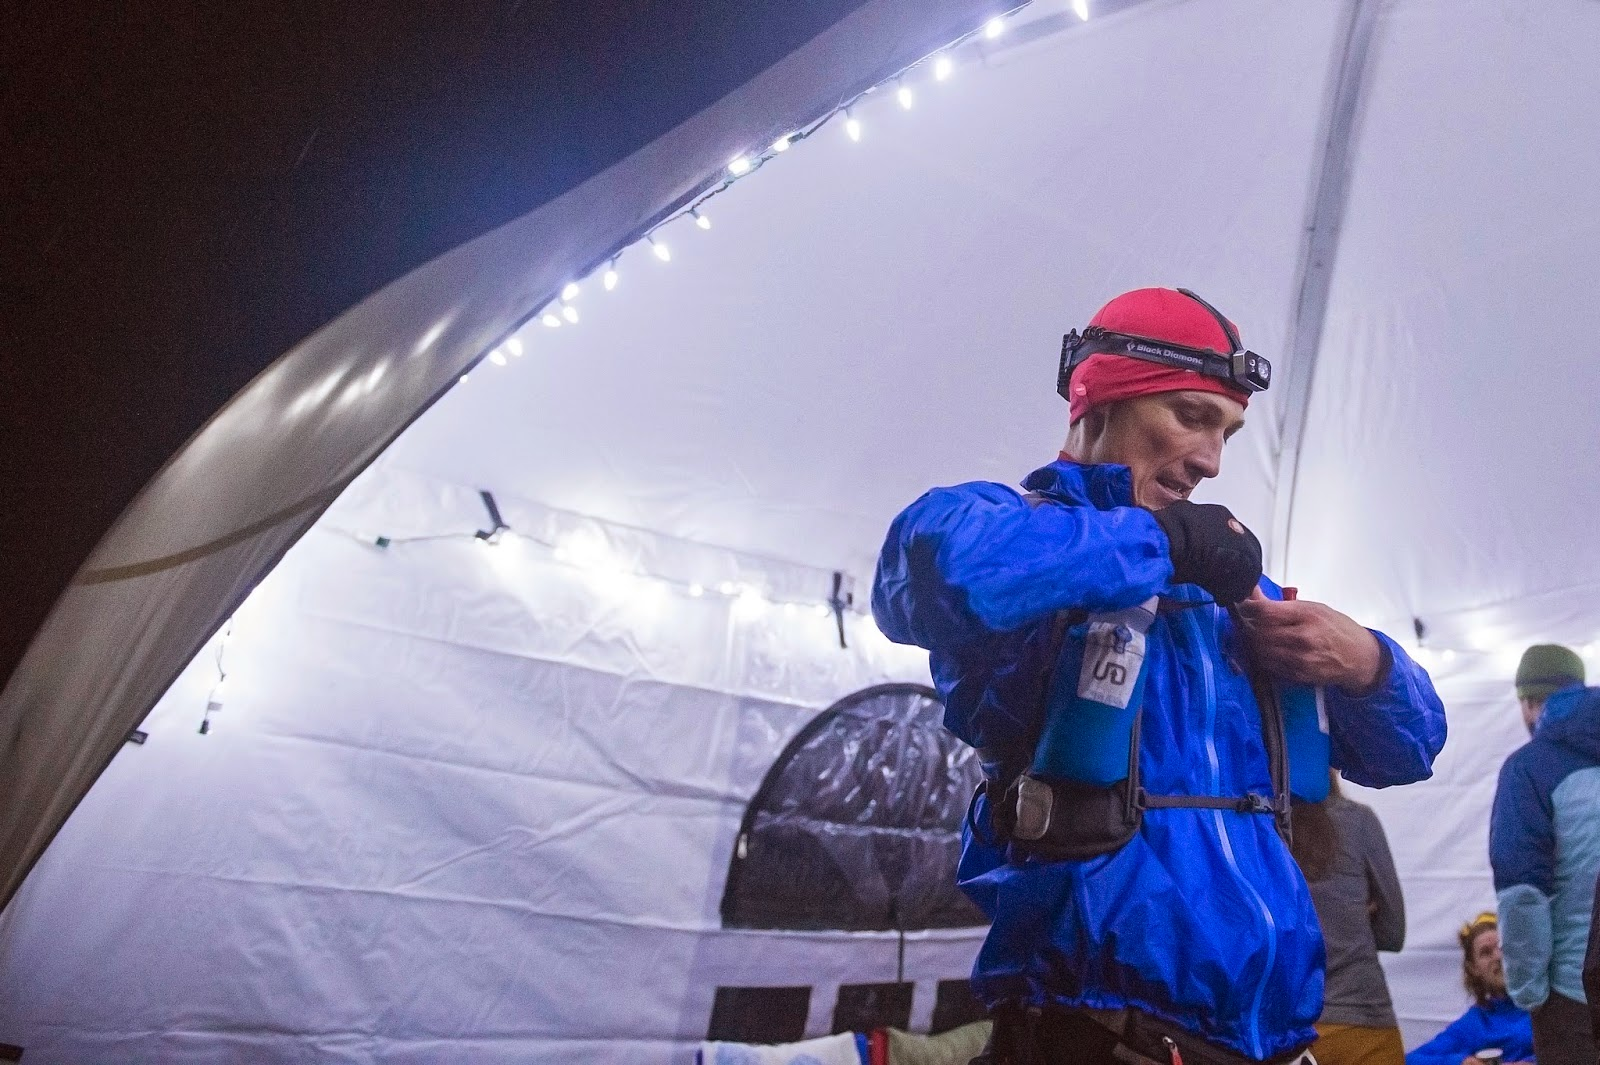 http://photos.denverpost.com/2014/07/11/hardrock-100-endurance-race-telluride-colorado/